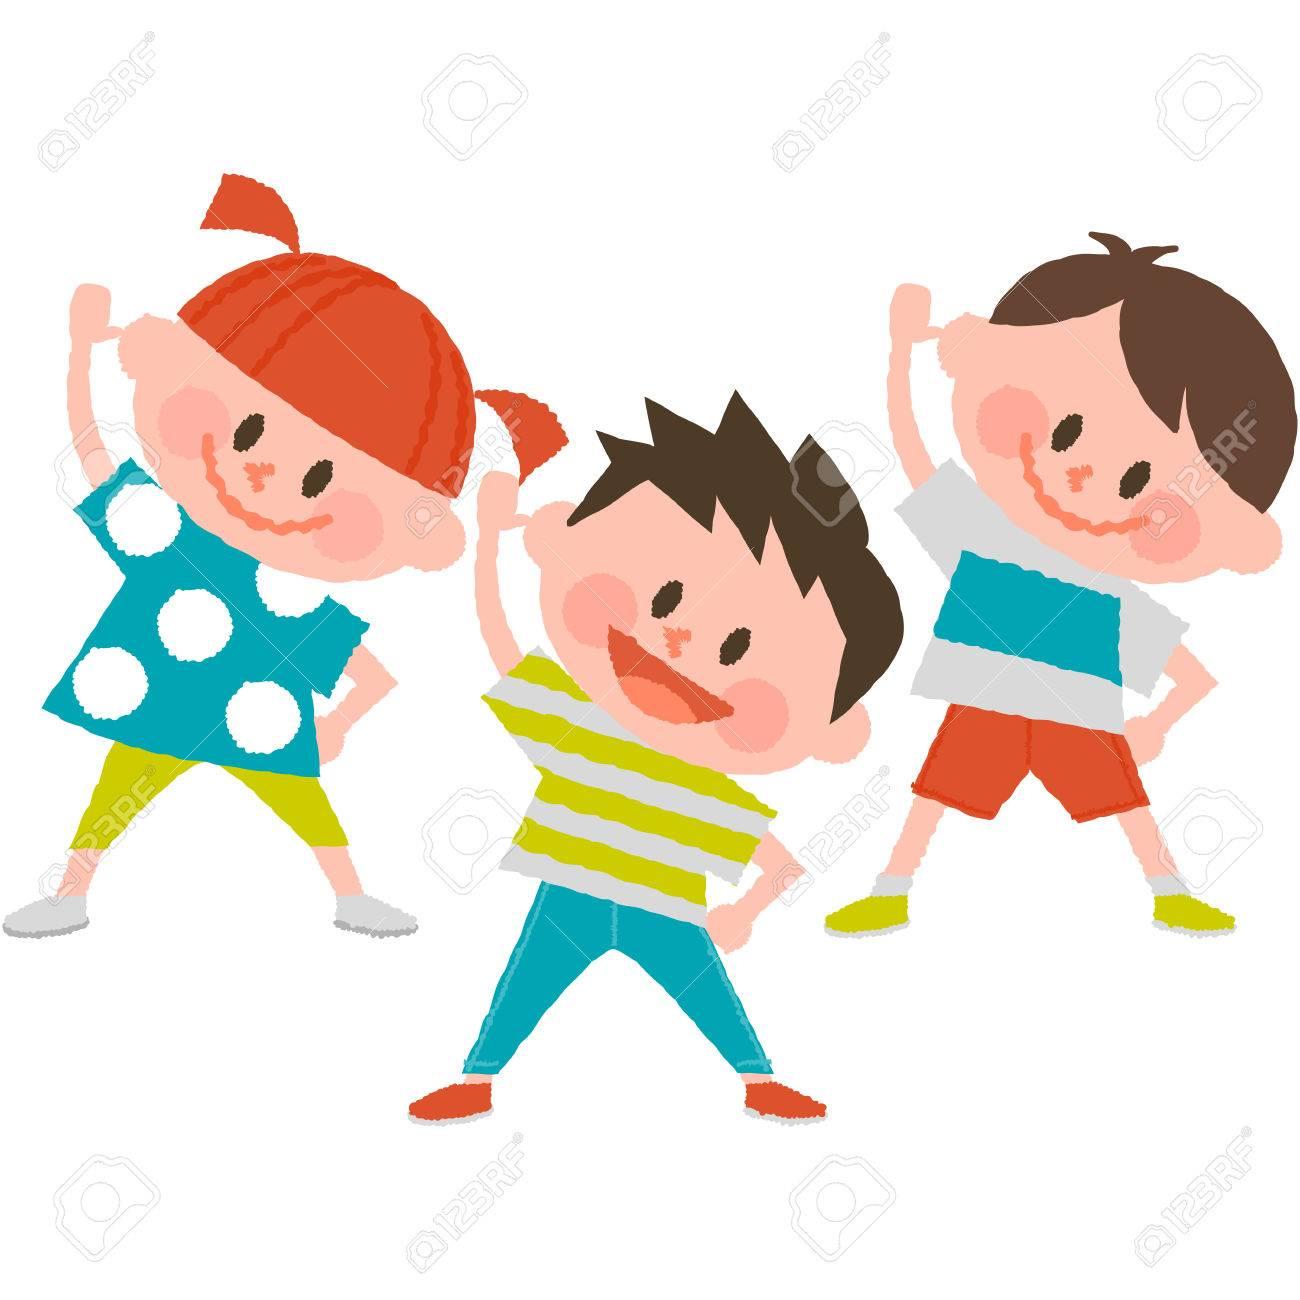 Cartoon Kids Exercising Royalty Free Cliparts Vectors And Stock Illustration Image 72142634